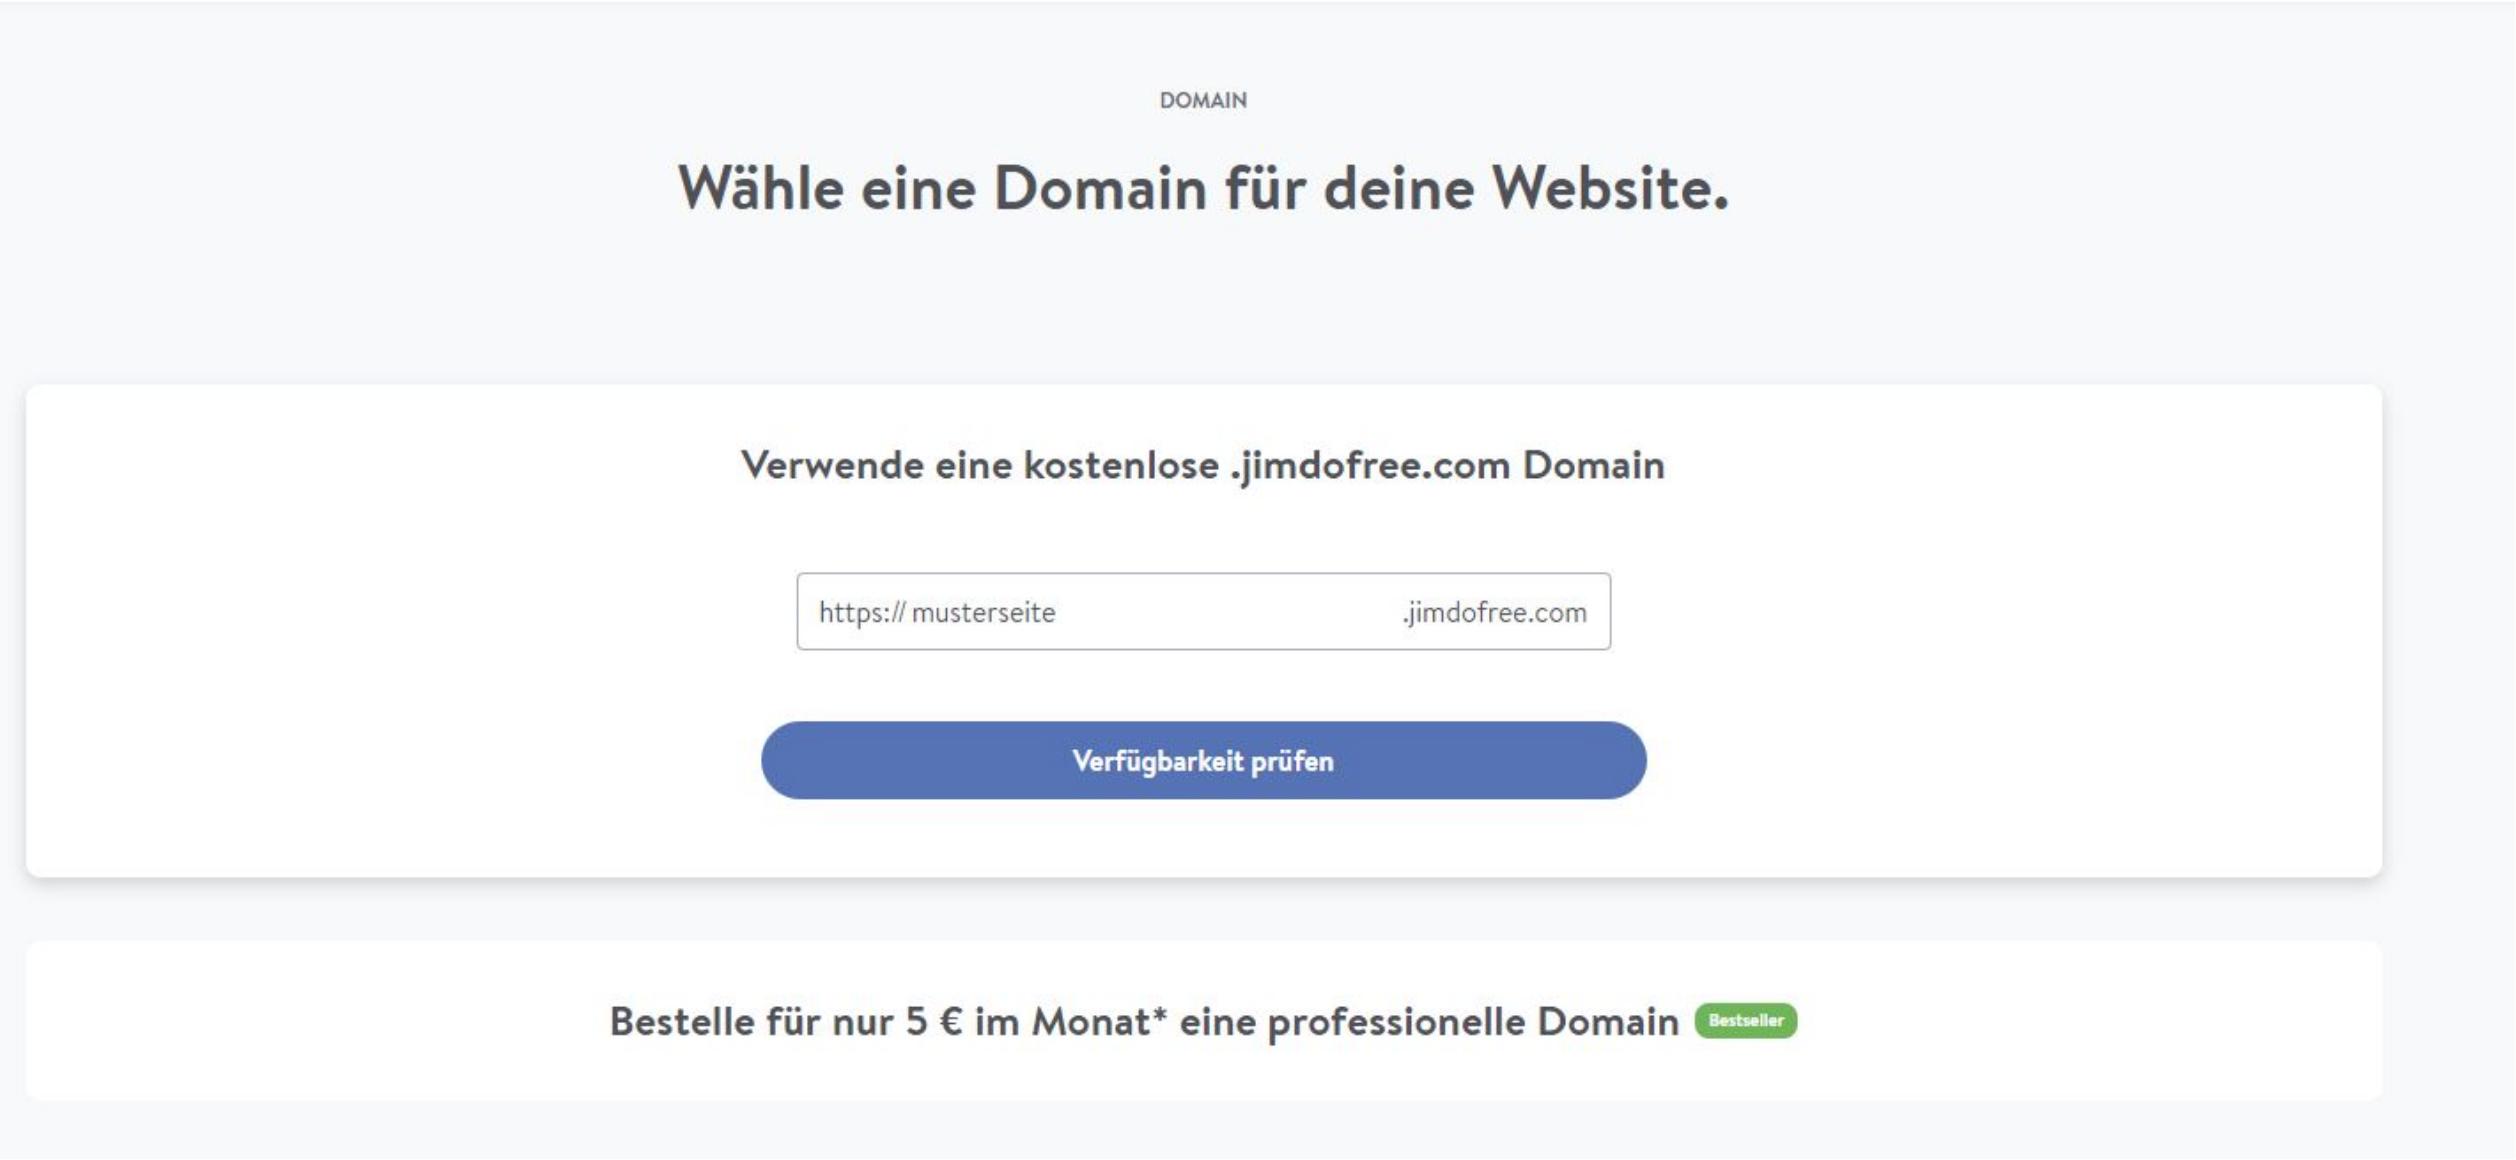 Kostenlose Homepage: Domainwahl